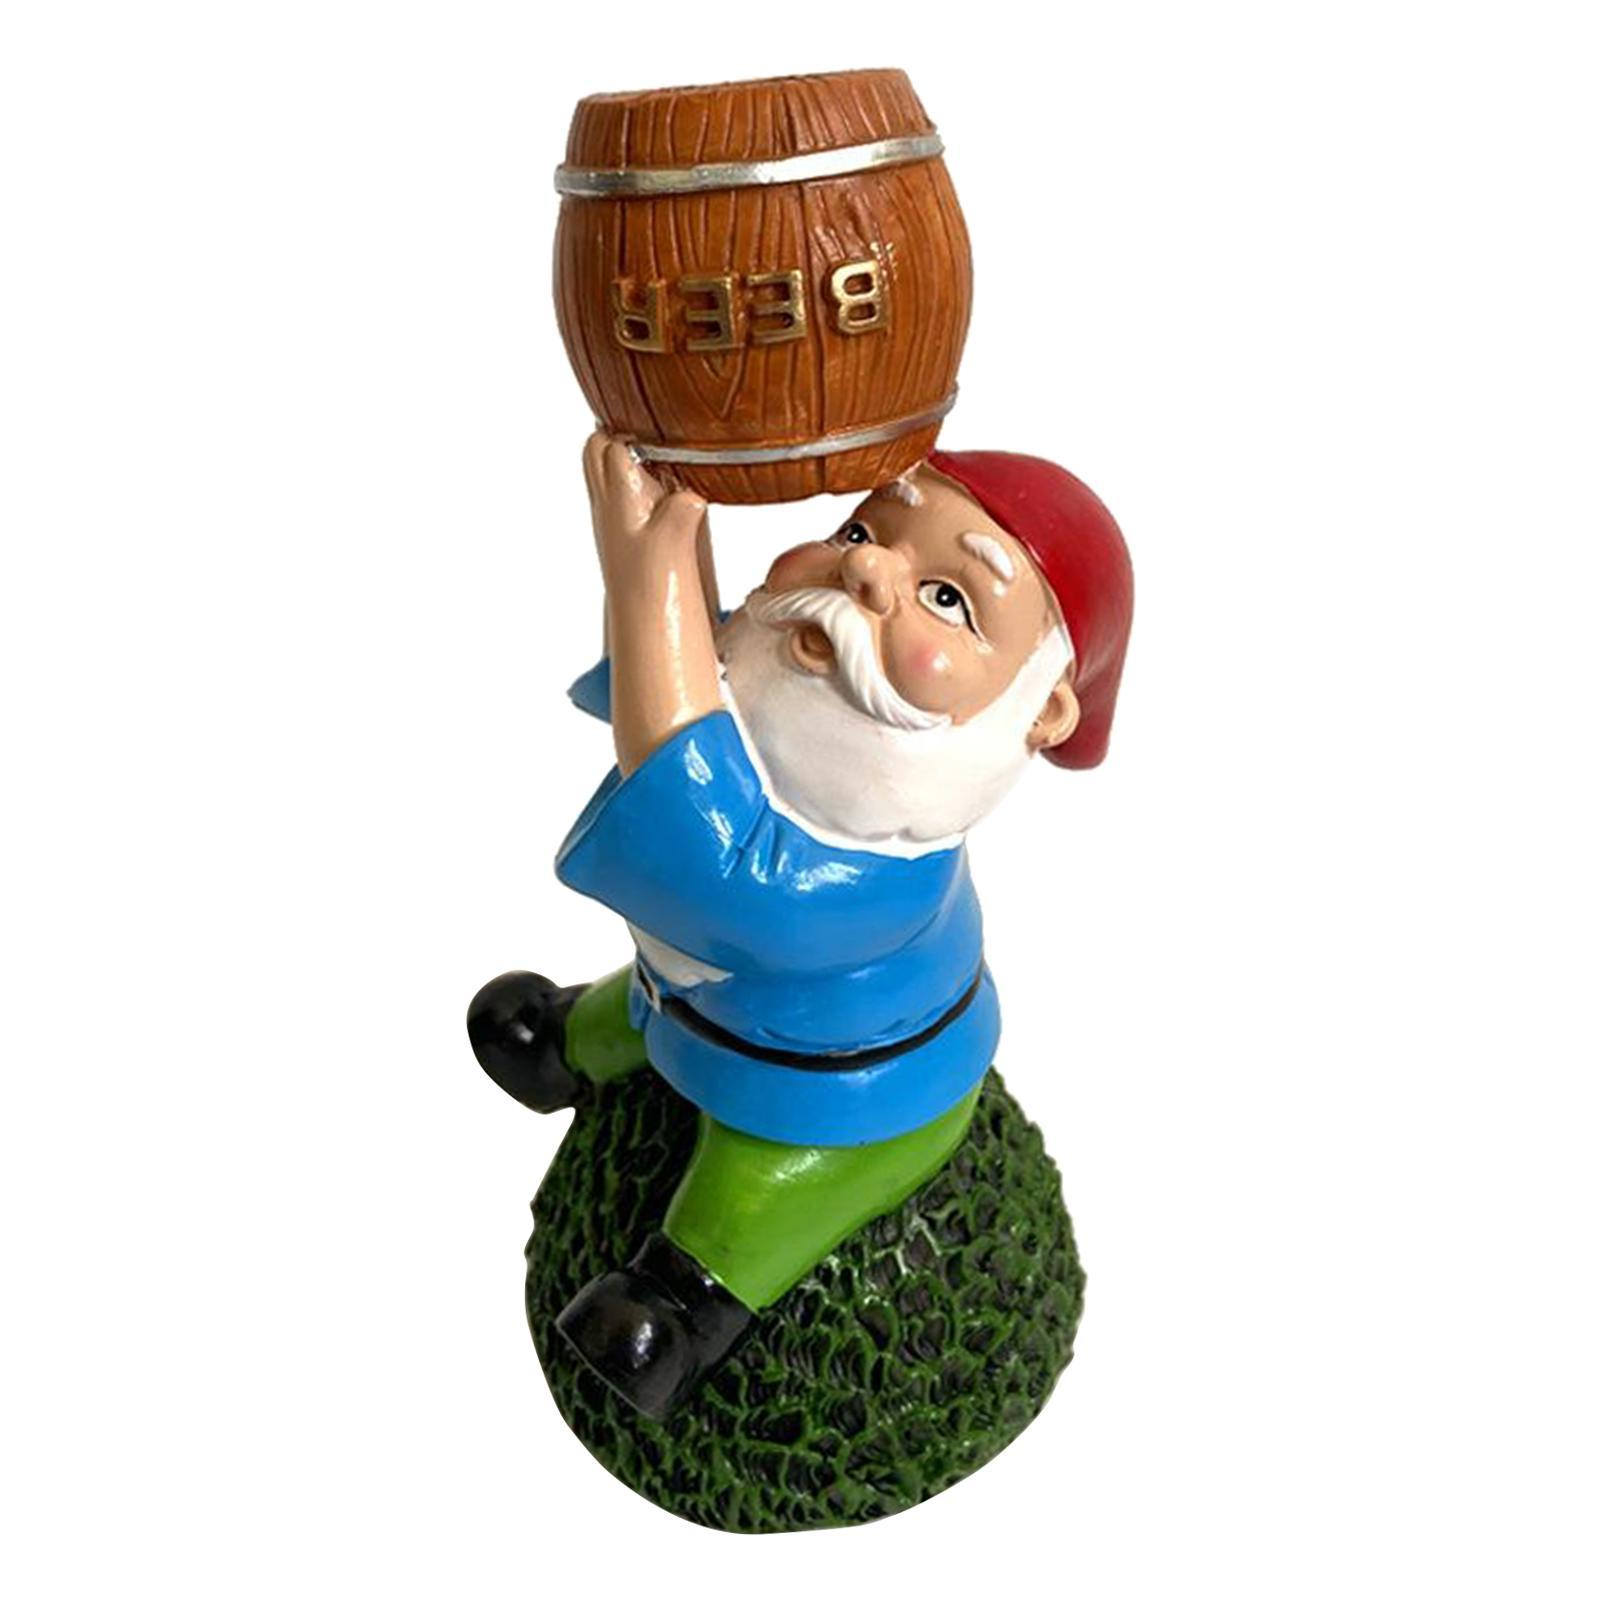 thumbnail 22 - Funny Resin Naughty Garden Gnome Statue Ornaments Outdoor Villa Home Figurines